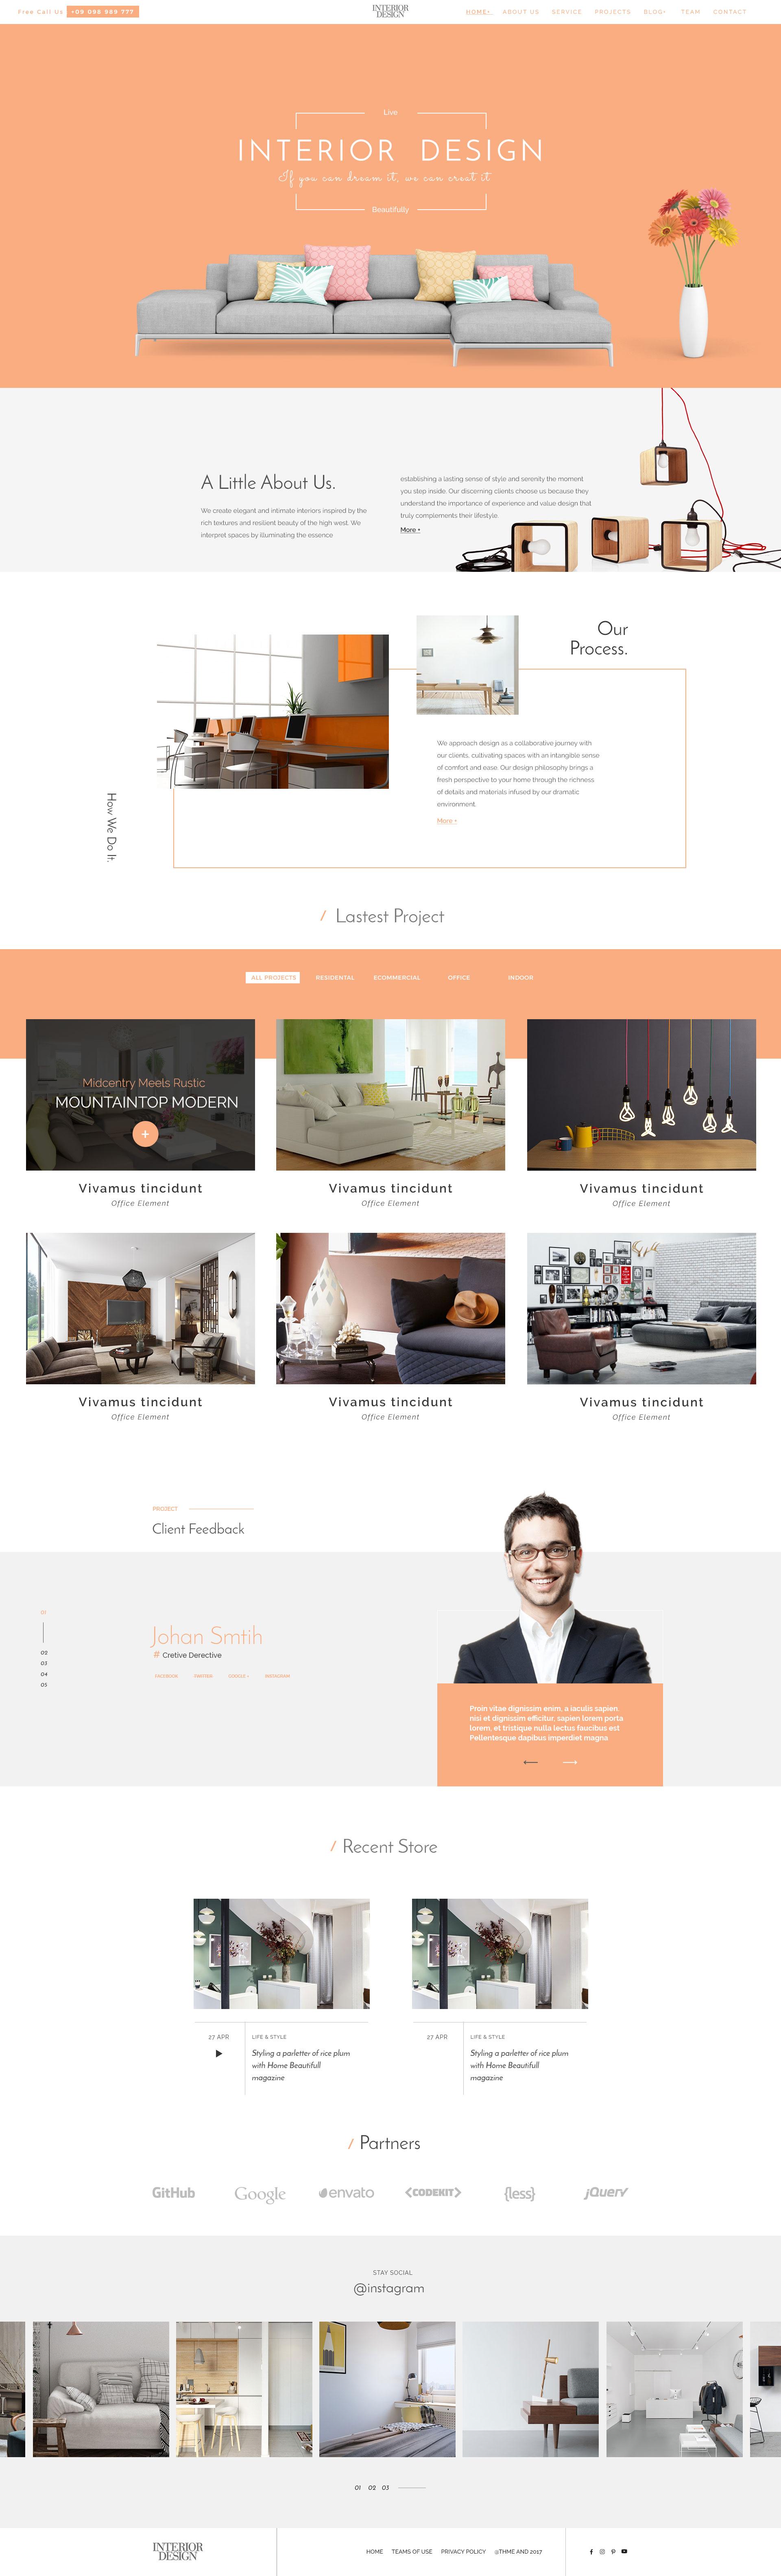 Interior Design - HTML5 Template for Interior Designer - 2